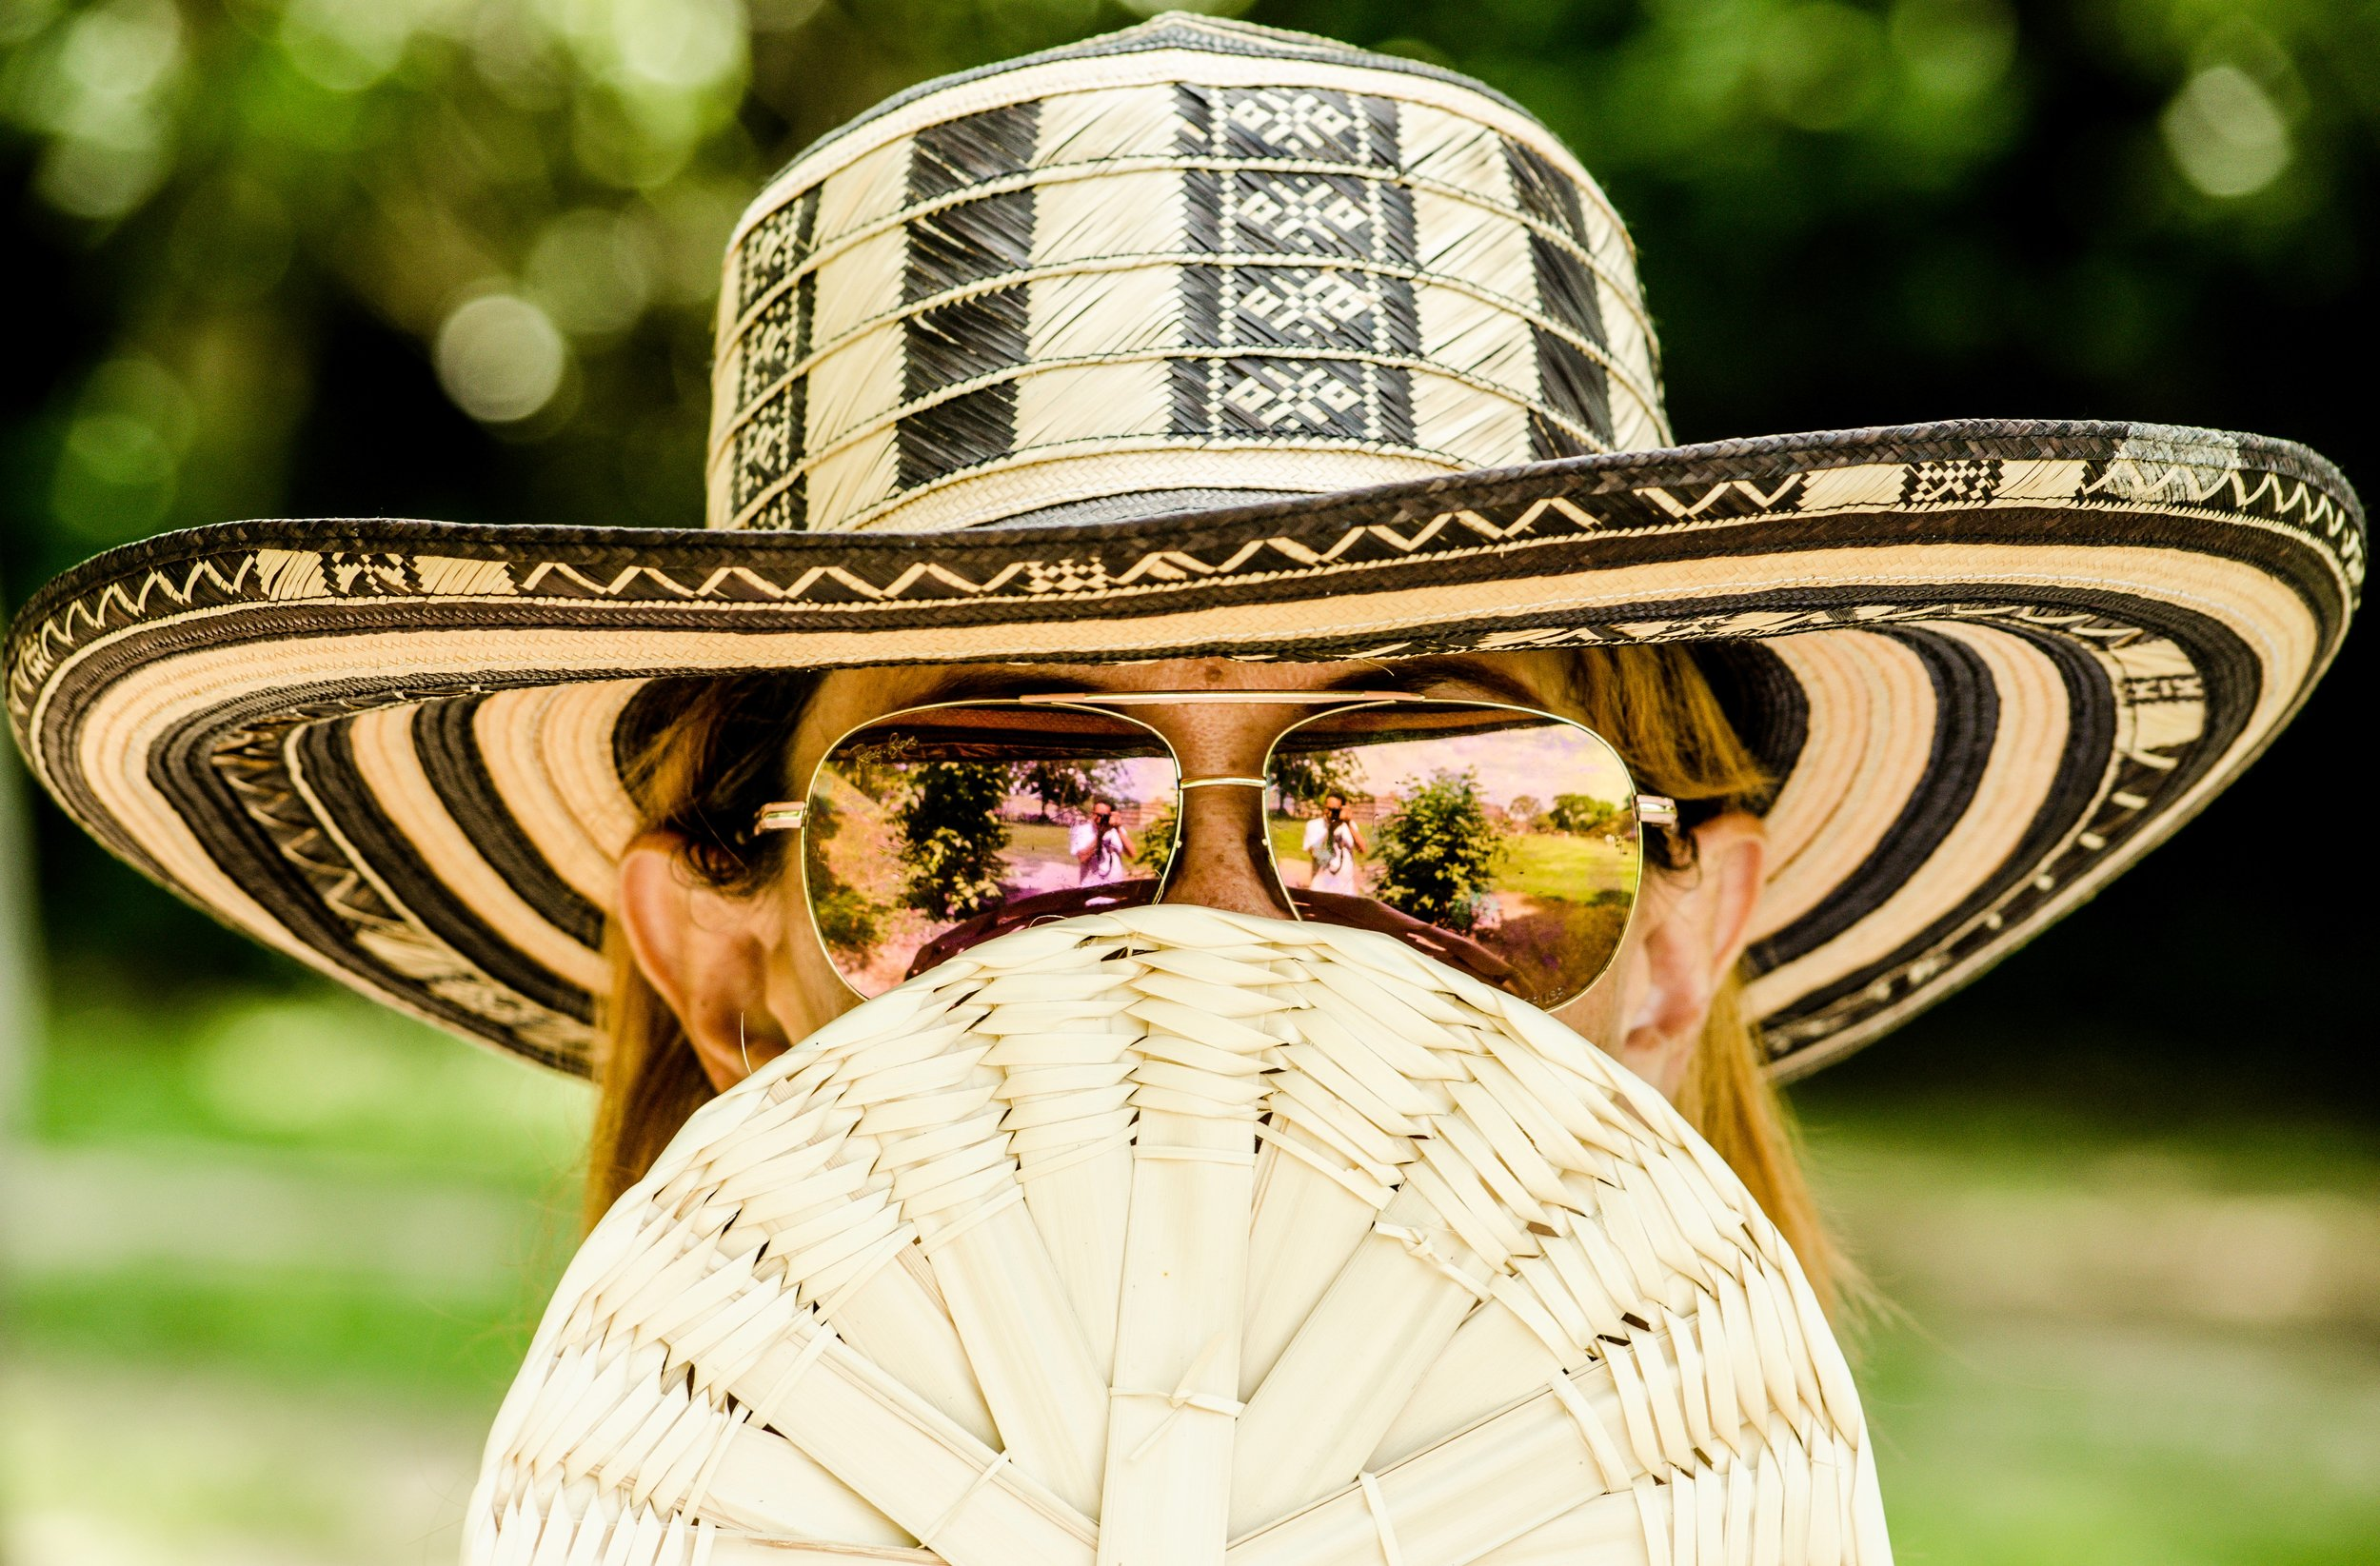 Photo by  Carlos Alberto Gómez Iñiguez  on  Unsplash